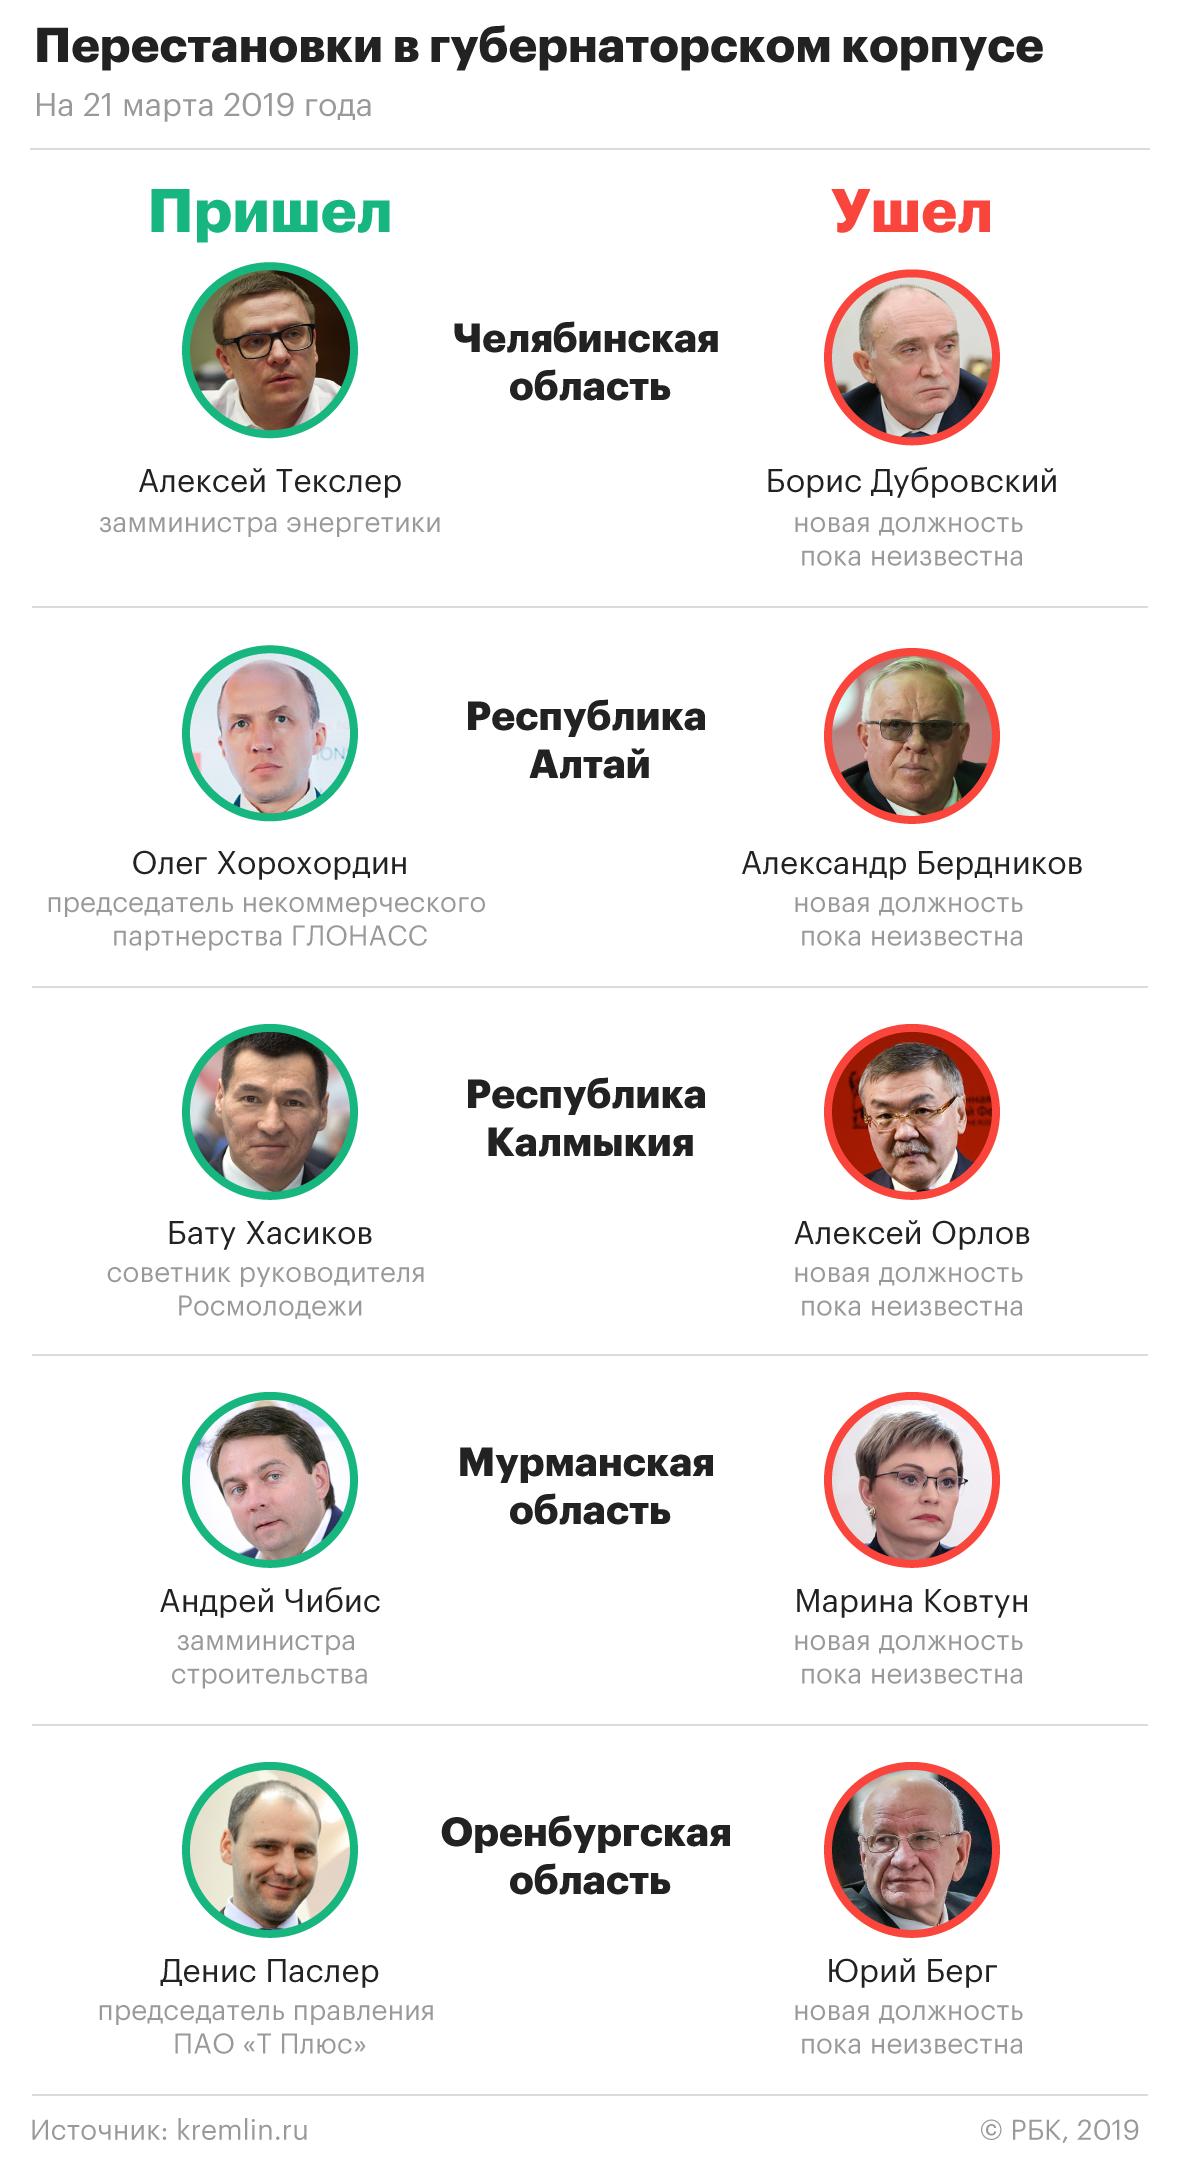 Кириенко объяснил принцип Путина по отбору чиновников